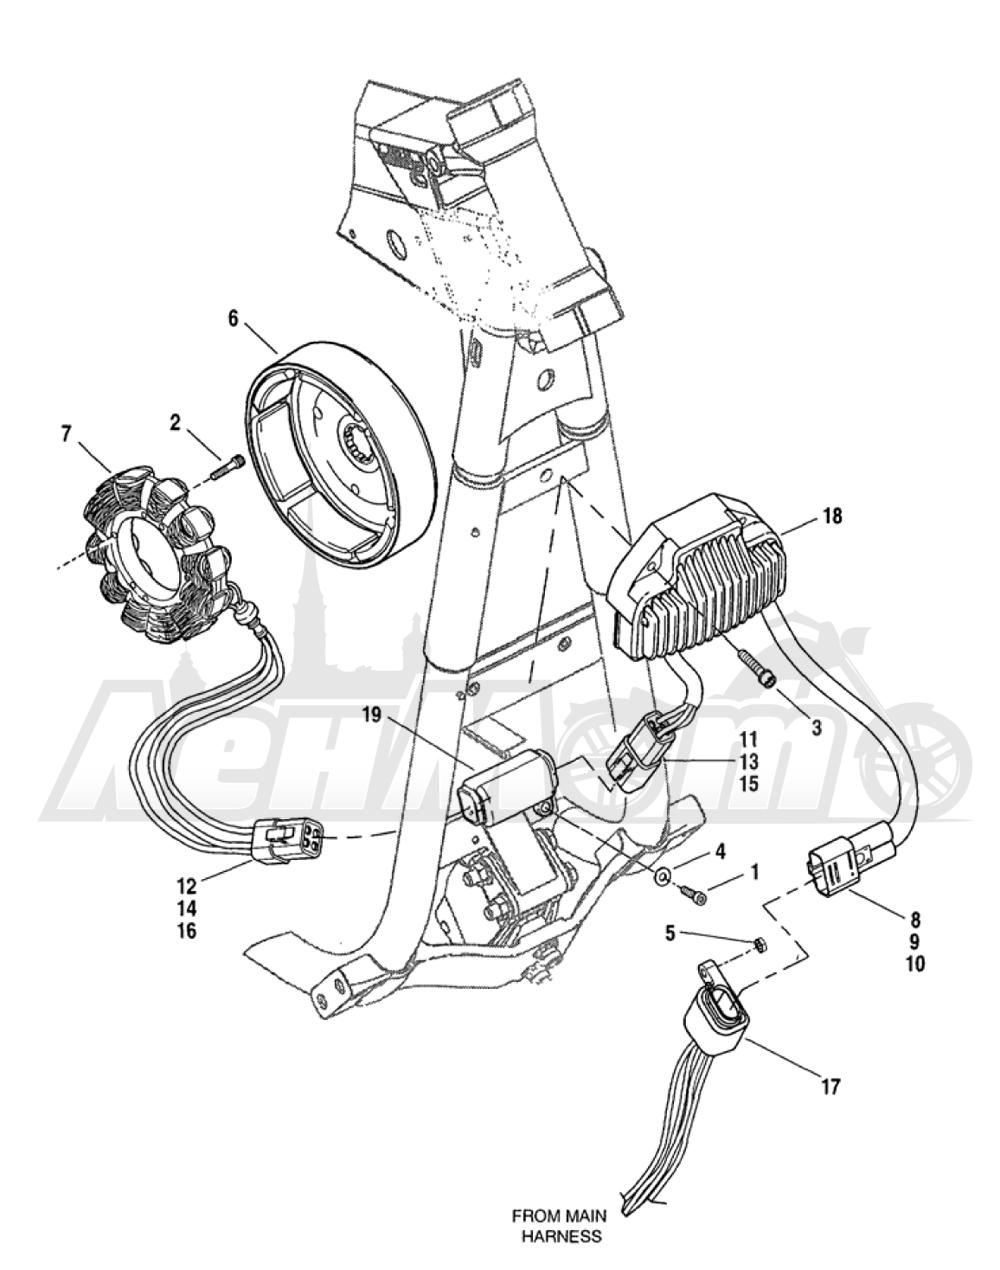 Запчасти для Мотоцикла Harley-Davidson 2005 FXDLI DYNA® LOW RIDER (INJECTION) (GN) Раздел: ELECTRICAL - ALTERNATOR W/ VOLTAGE REGULATOR | электрика генератор вместе с регулятор напряжения